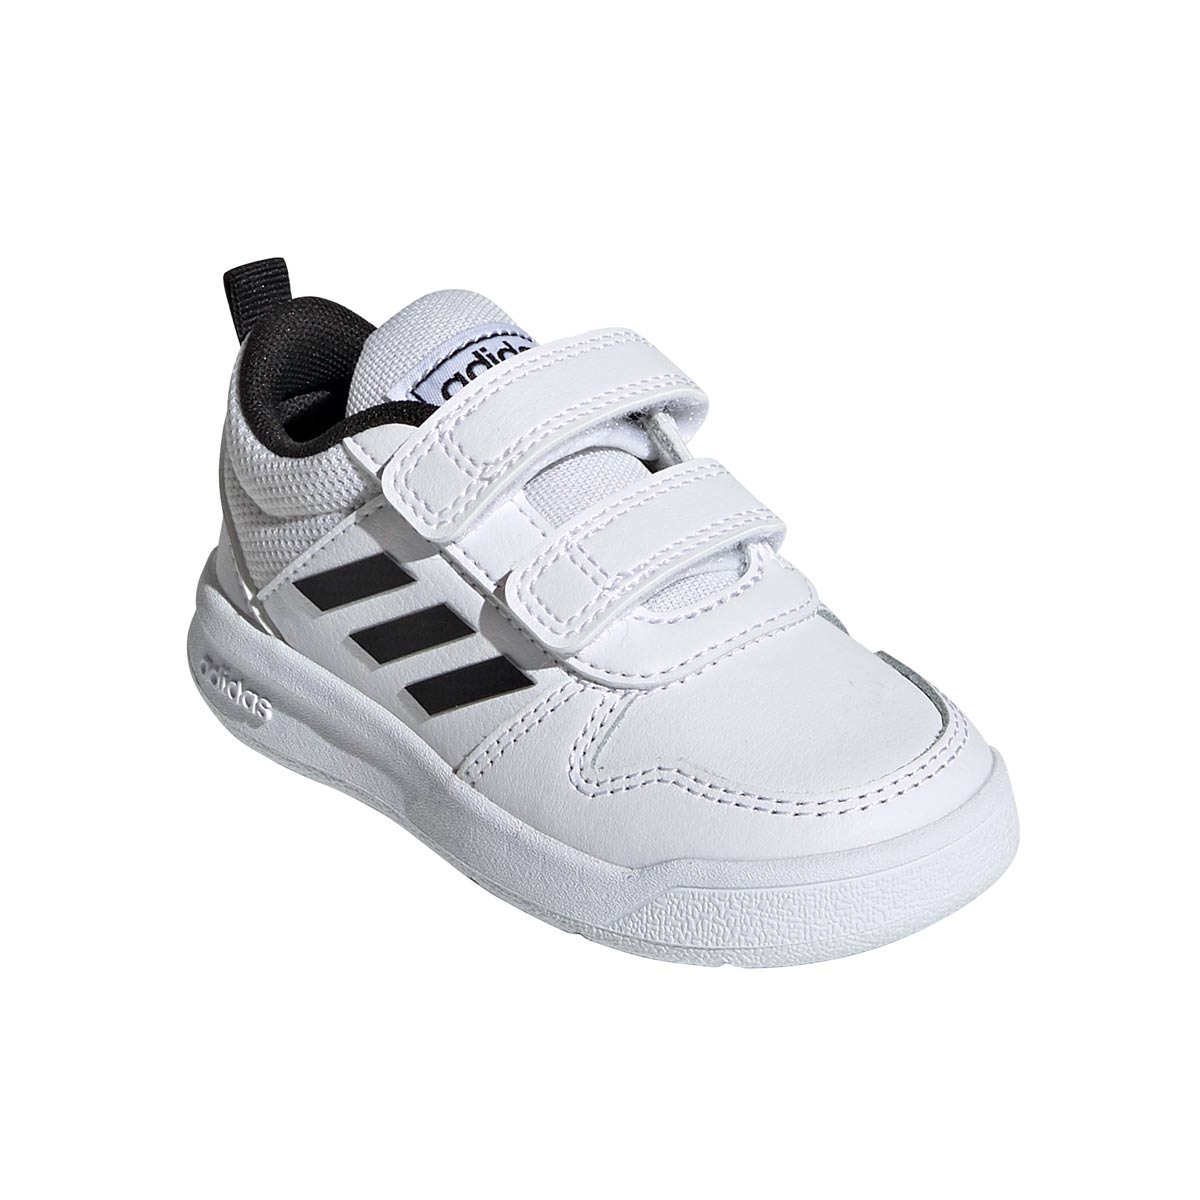 Tenis-Infantil-Adidas-Tensaurus-I--18-ao-25-